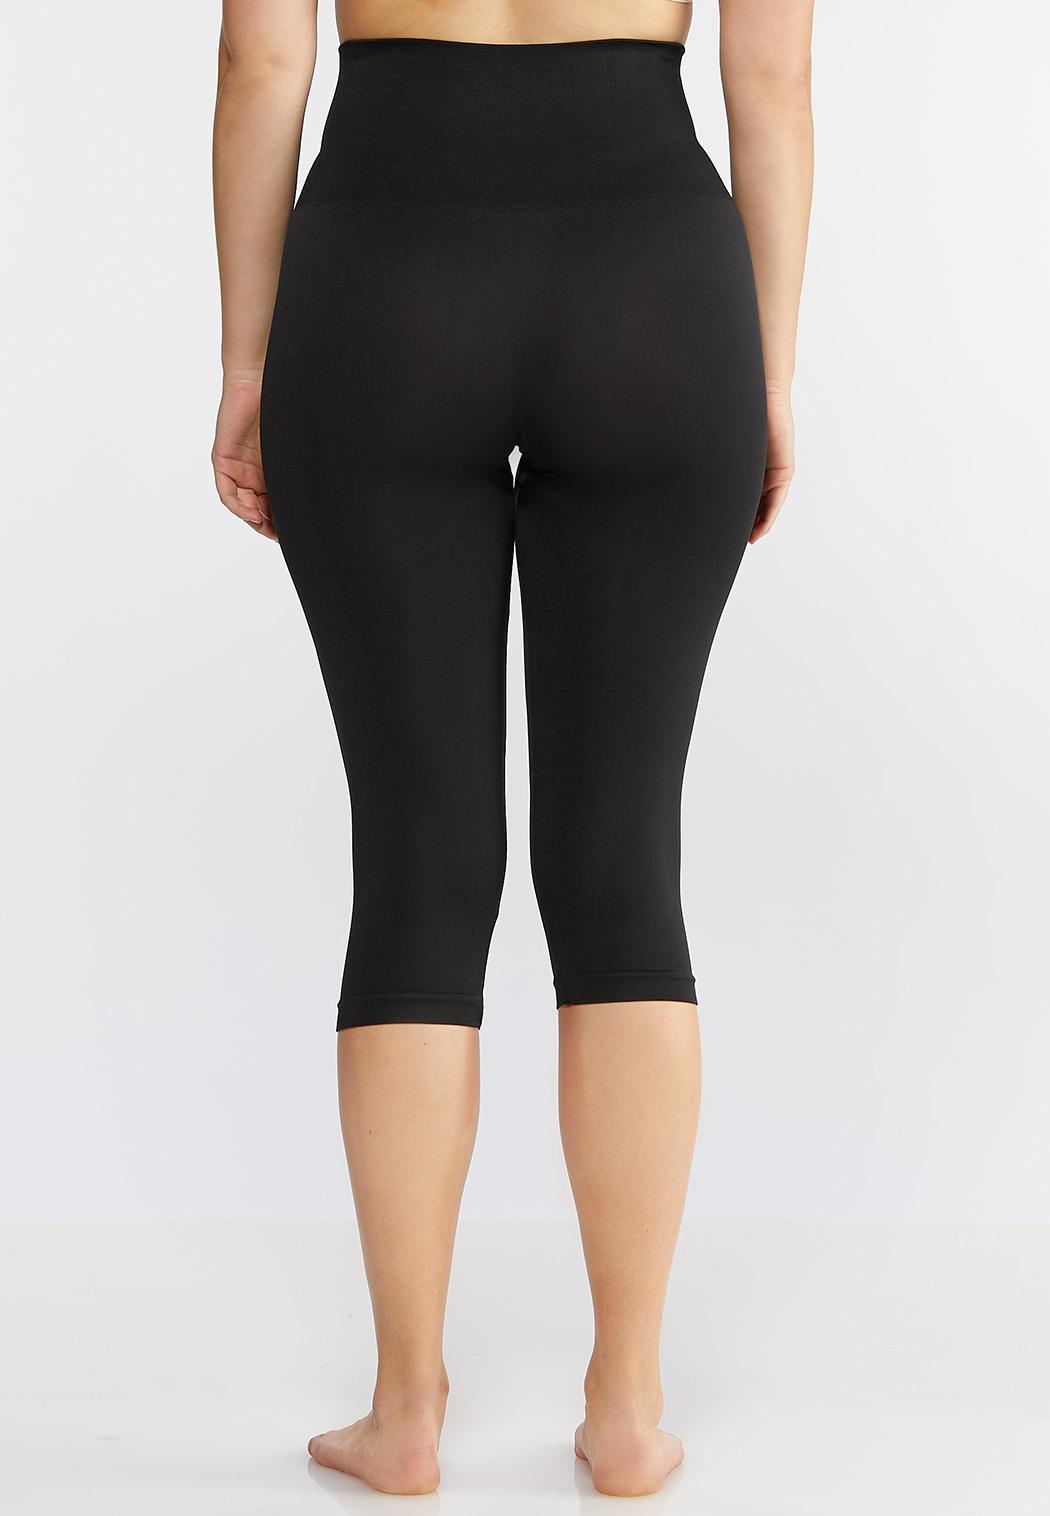 Plus Extended The Perfect Capri Leggings (Item #38545737)